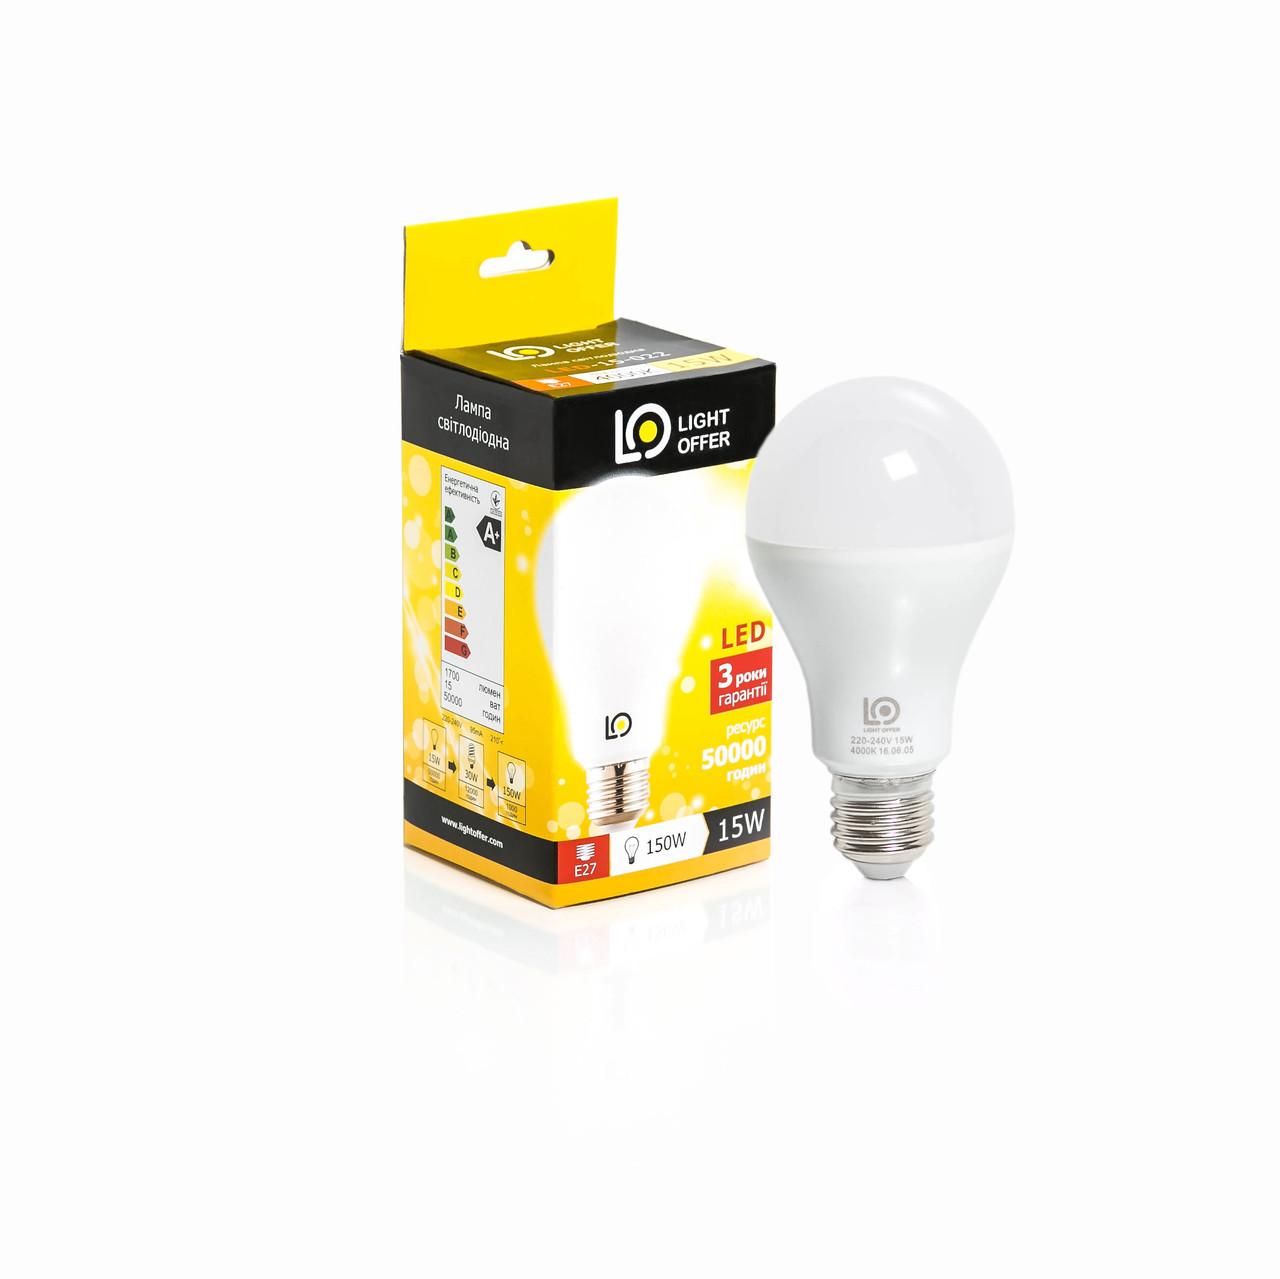 Светодиодная лампа LightOffer A68 15W E27 4000K